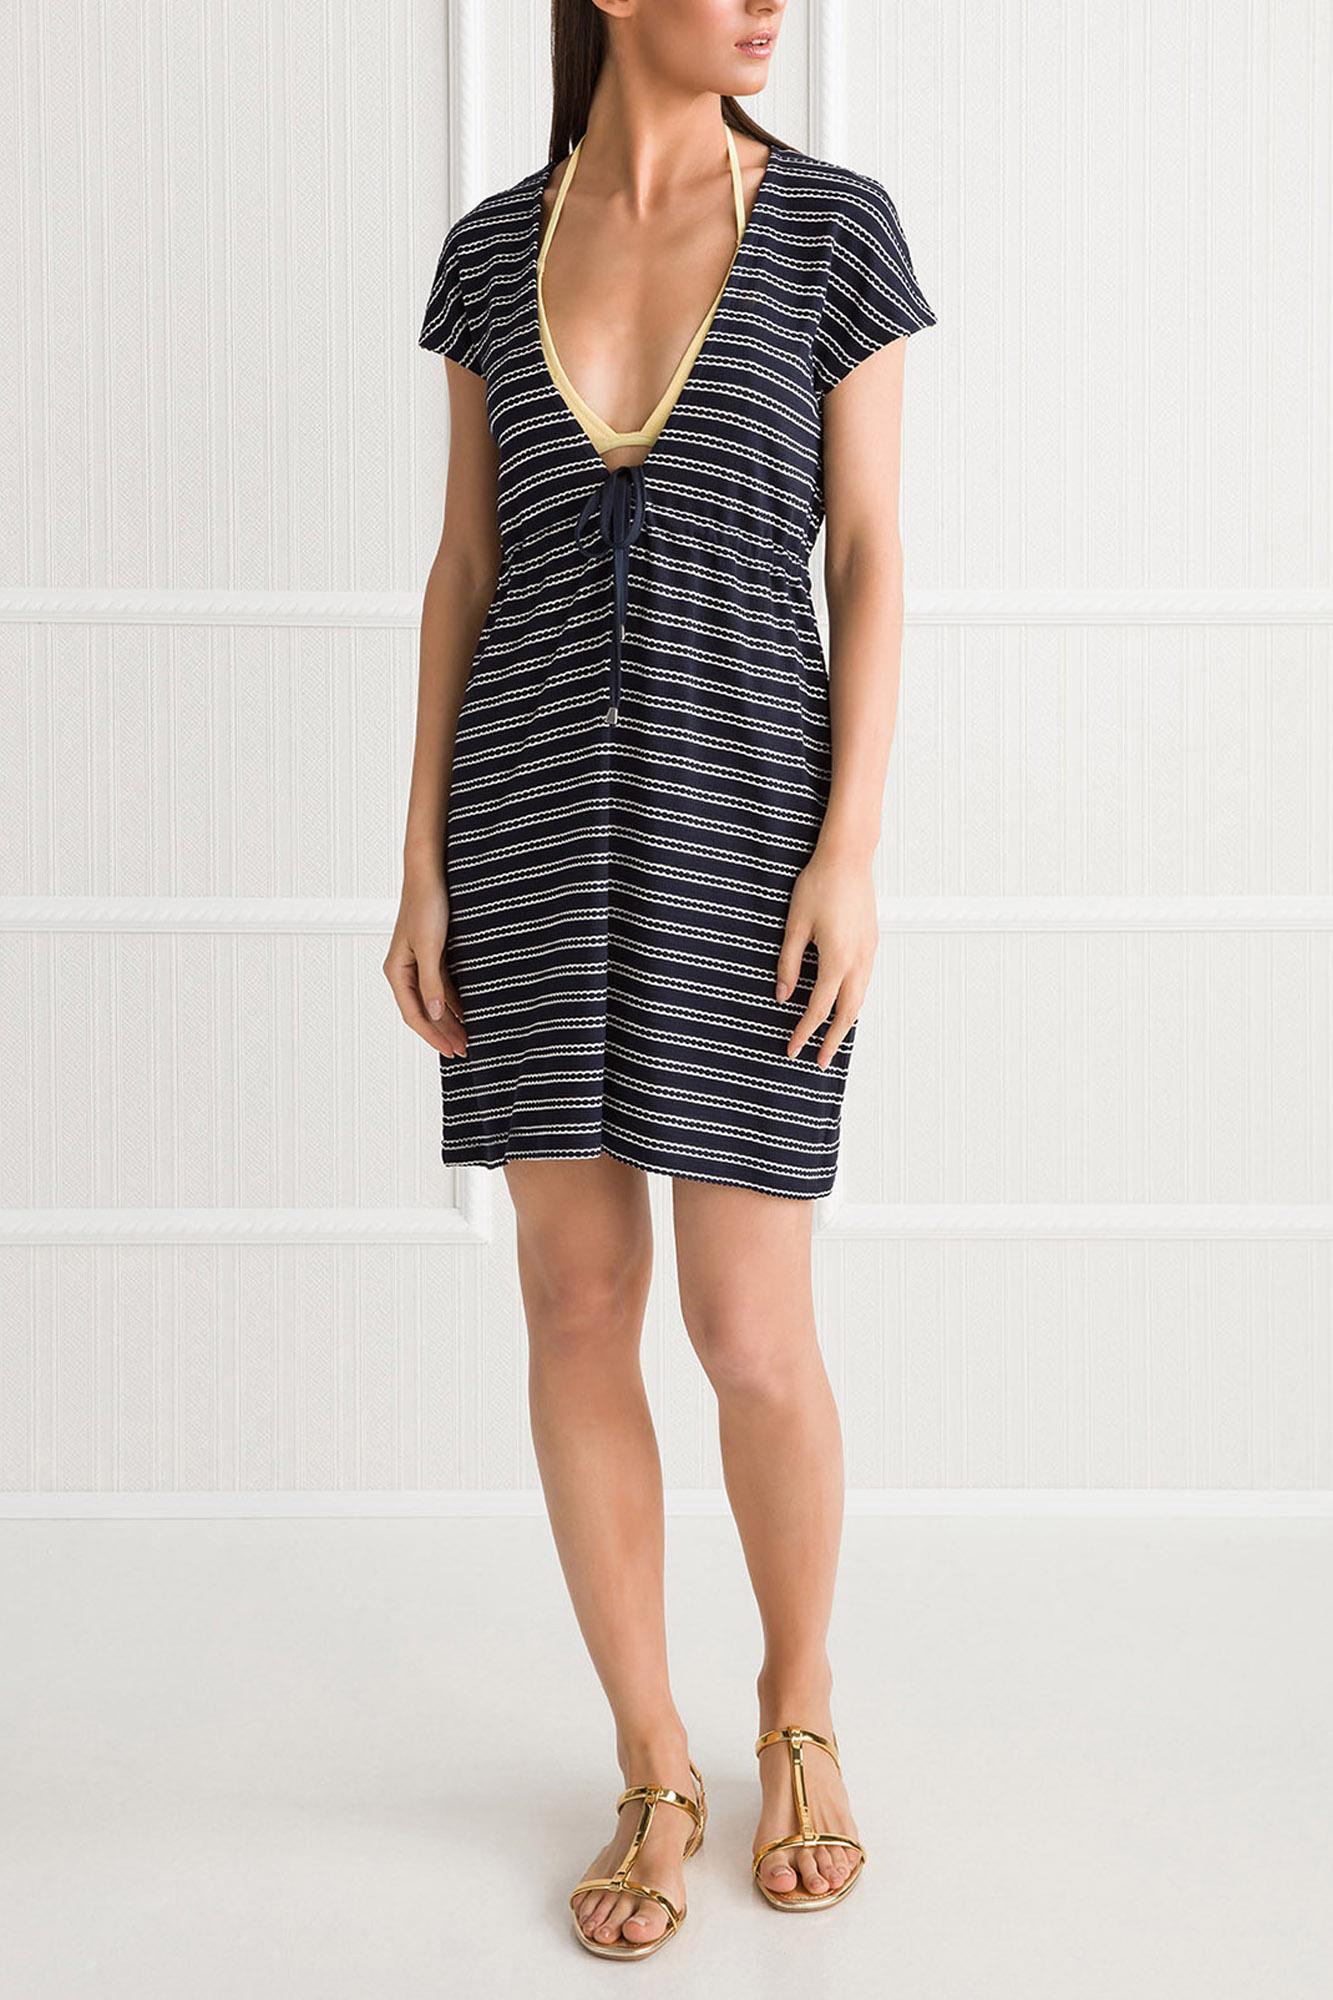 Striped Beach Dress with Deep V-neck